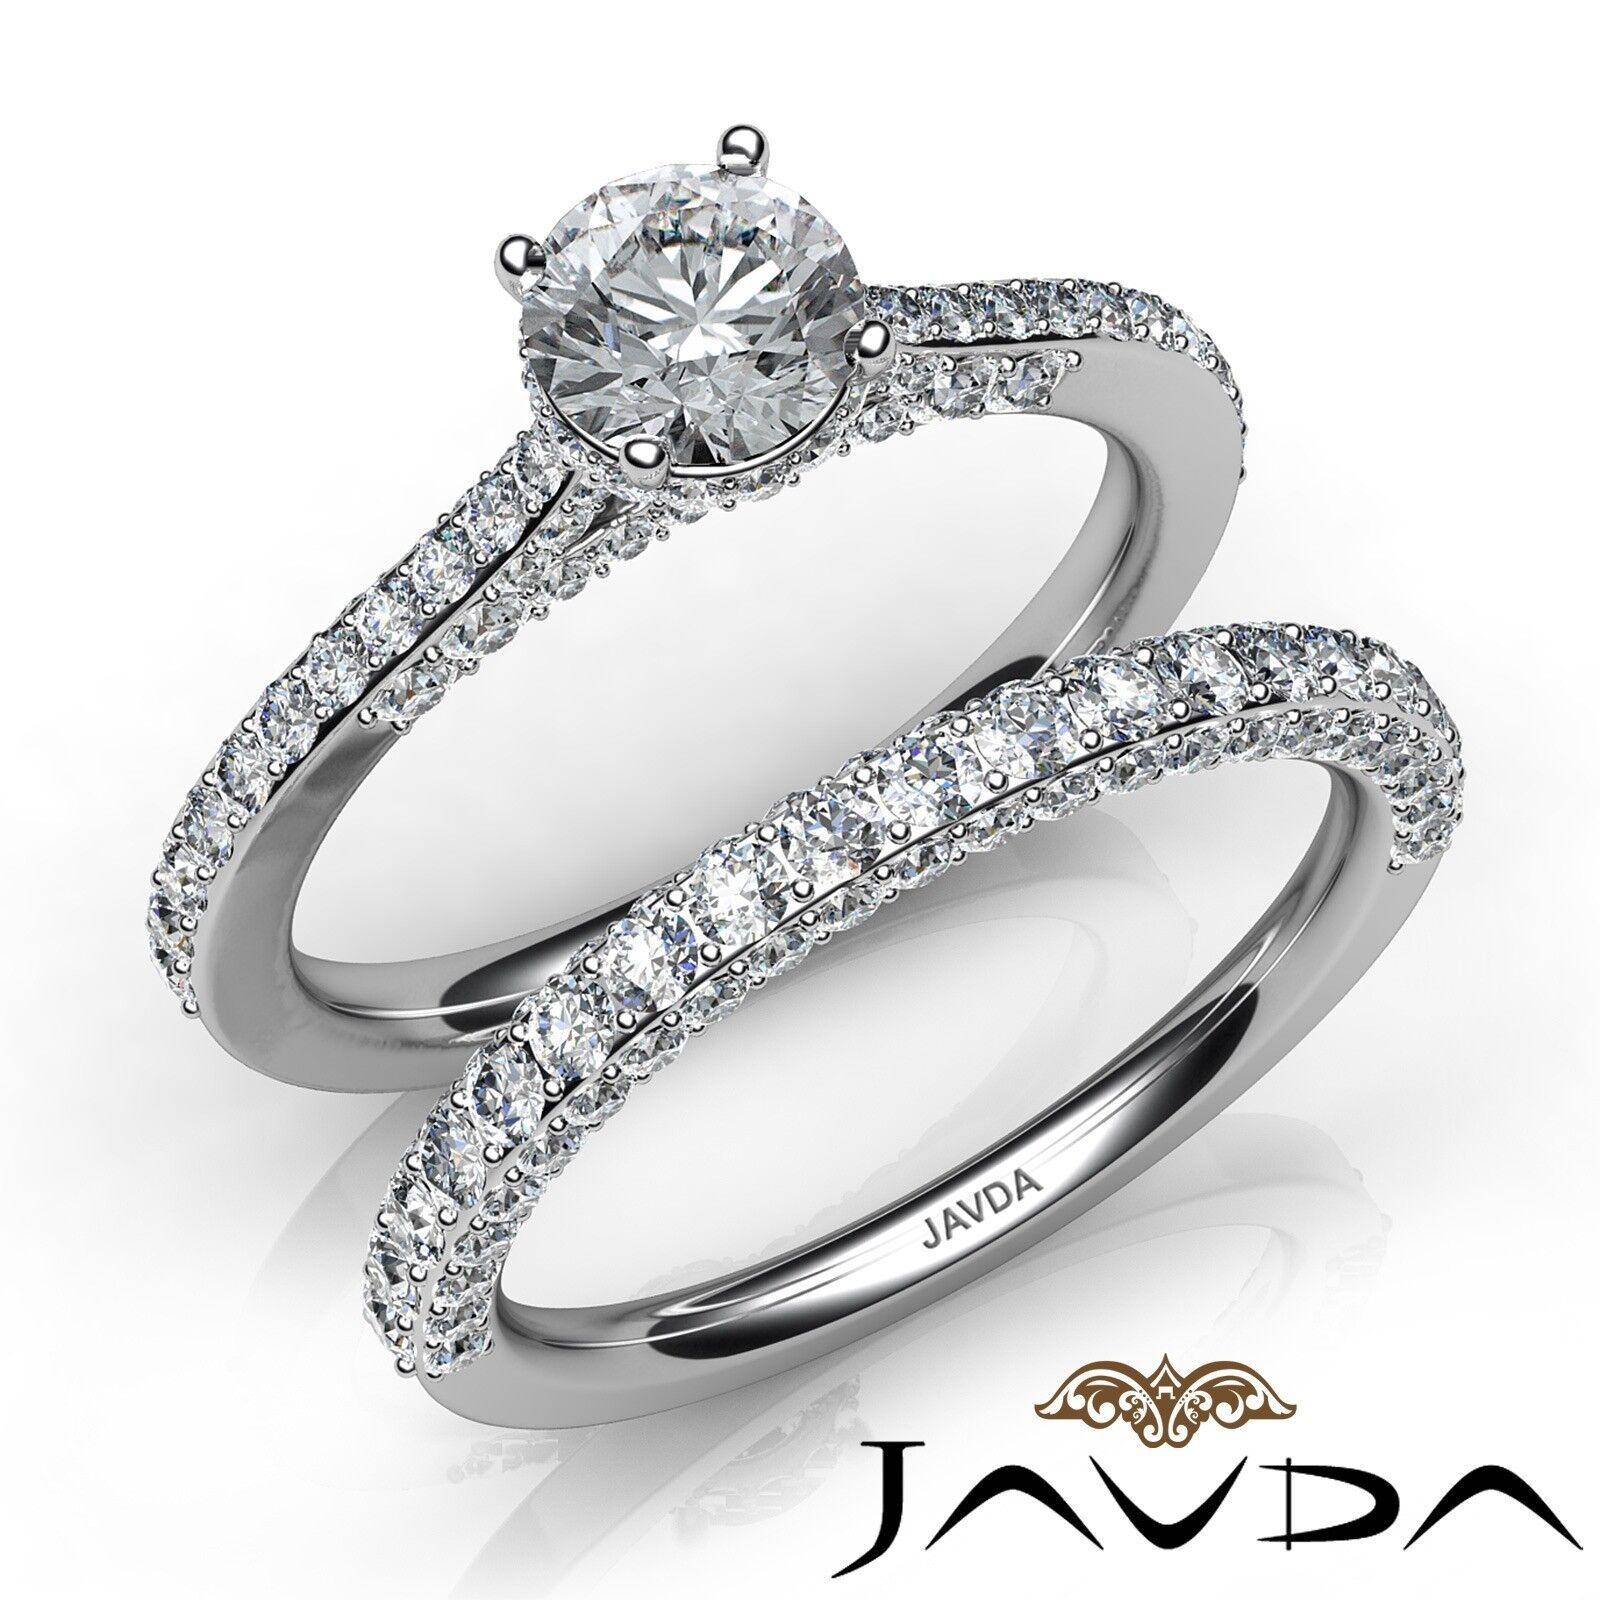 2.32ct Circa Halo Bridal Set Round Diamond Engagement Ring GIA H-VVS1 White Gold